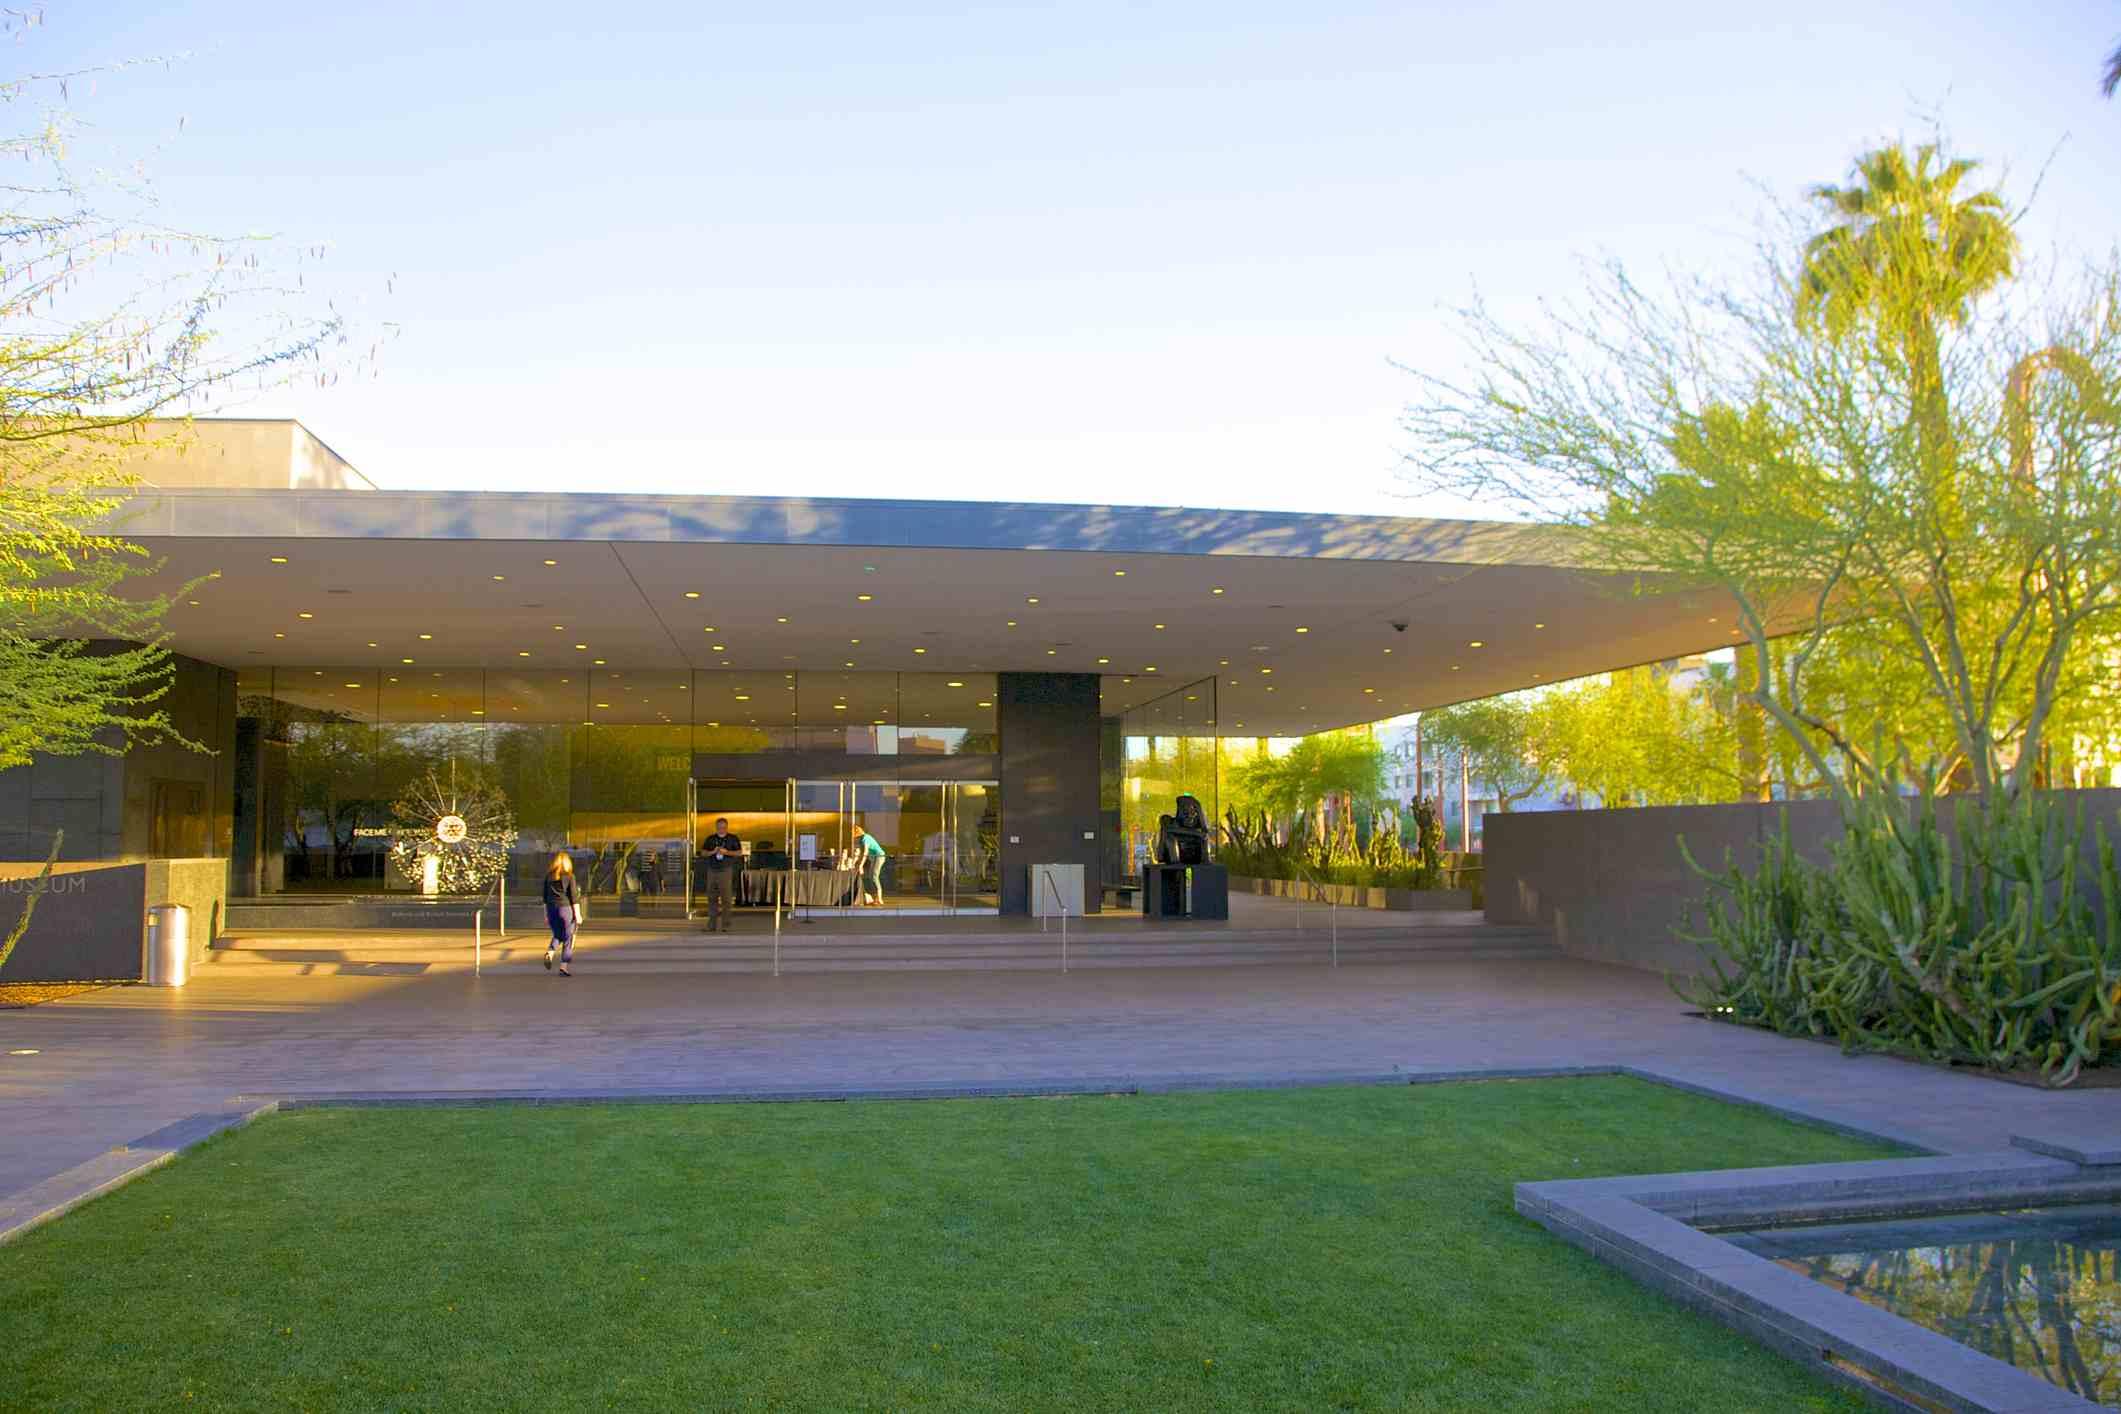 Entrance to the Phoenix Art Musuem